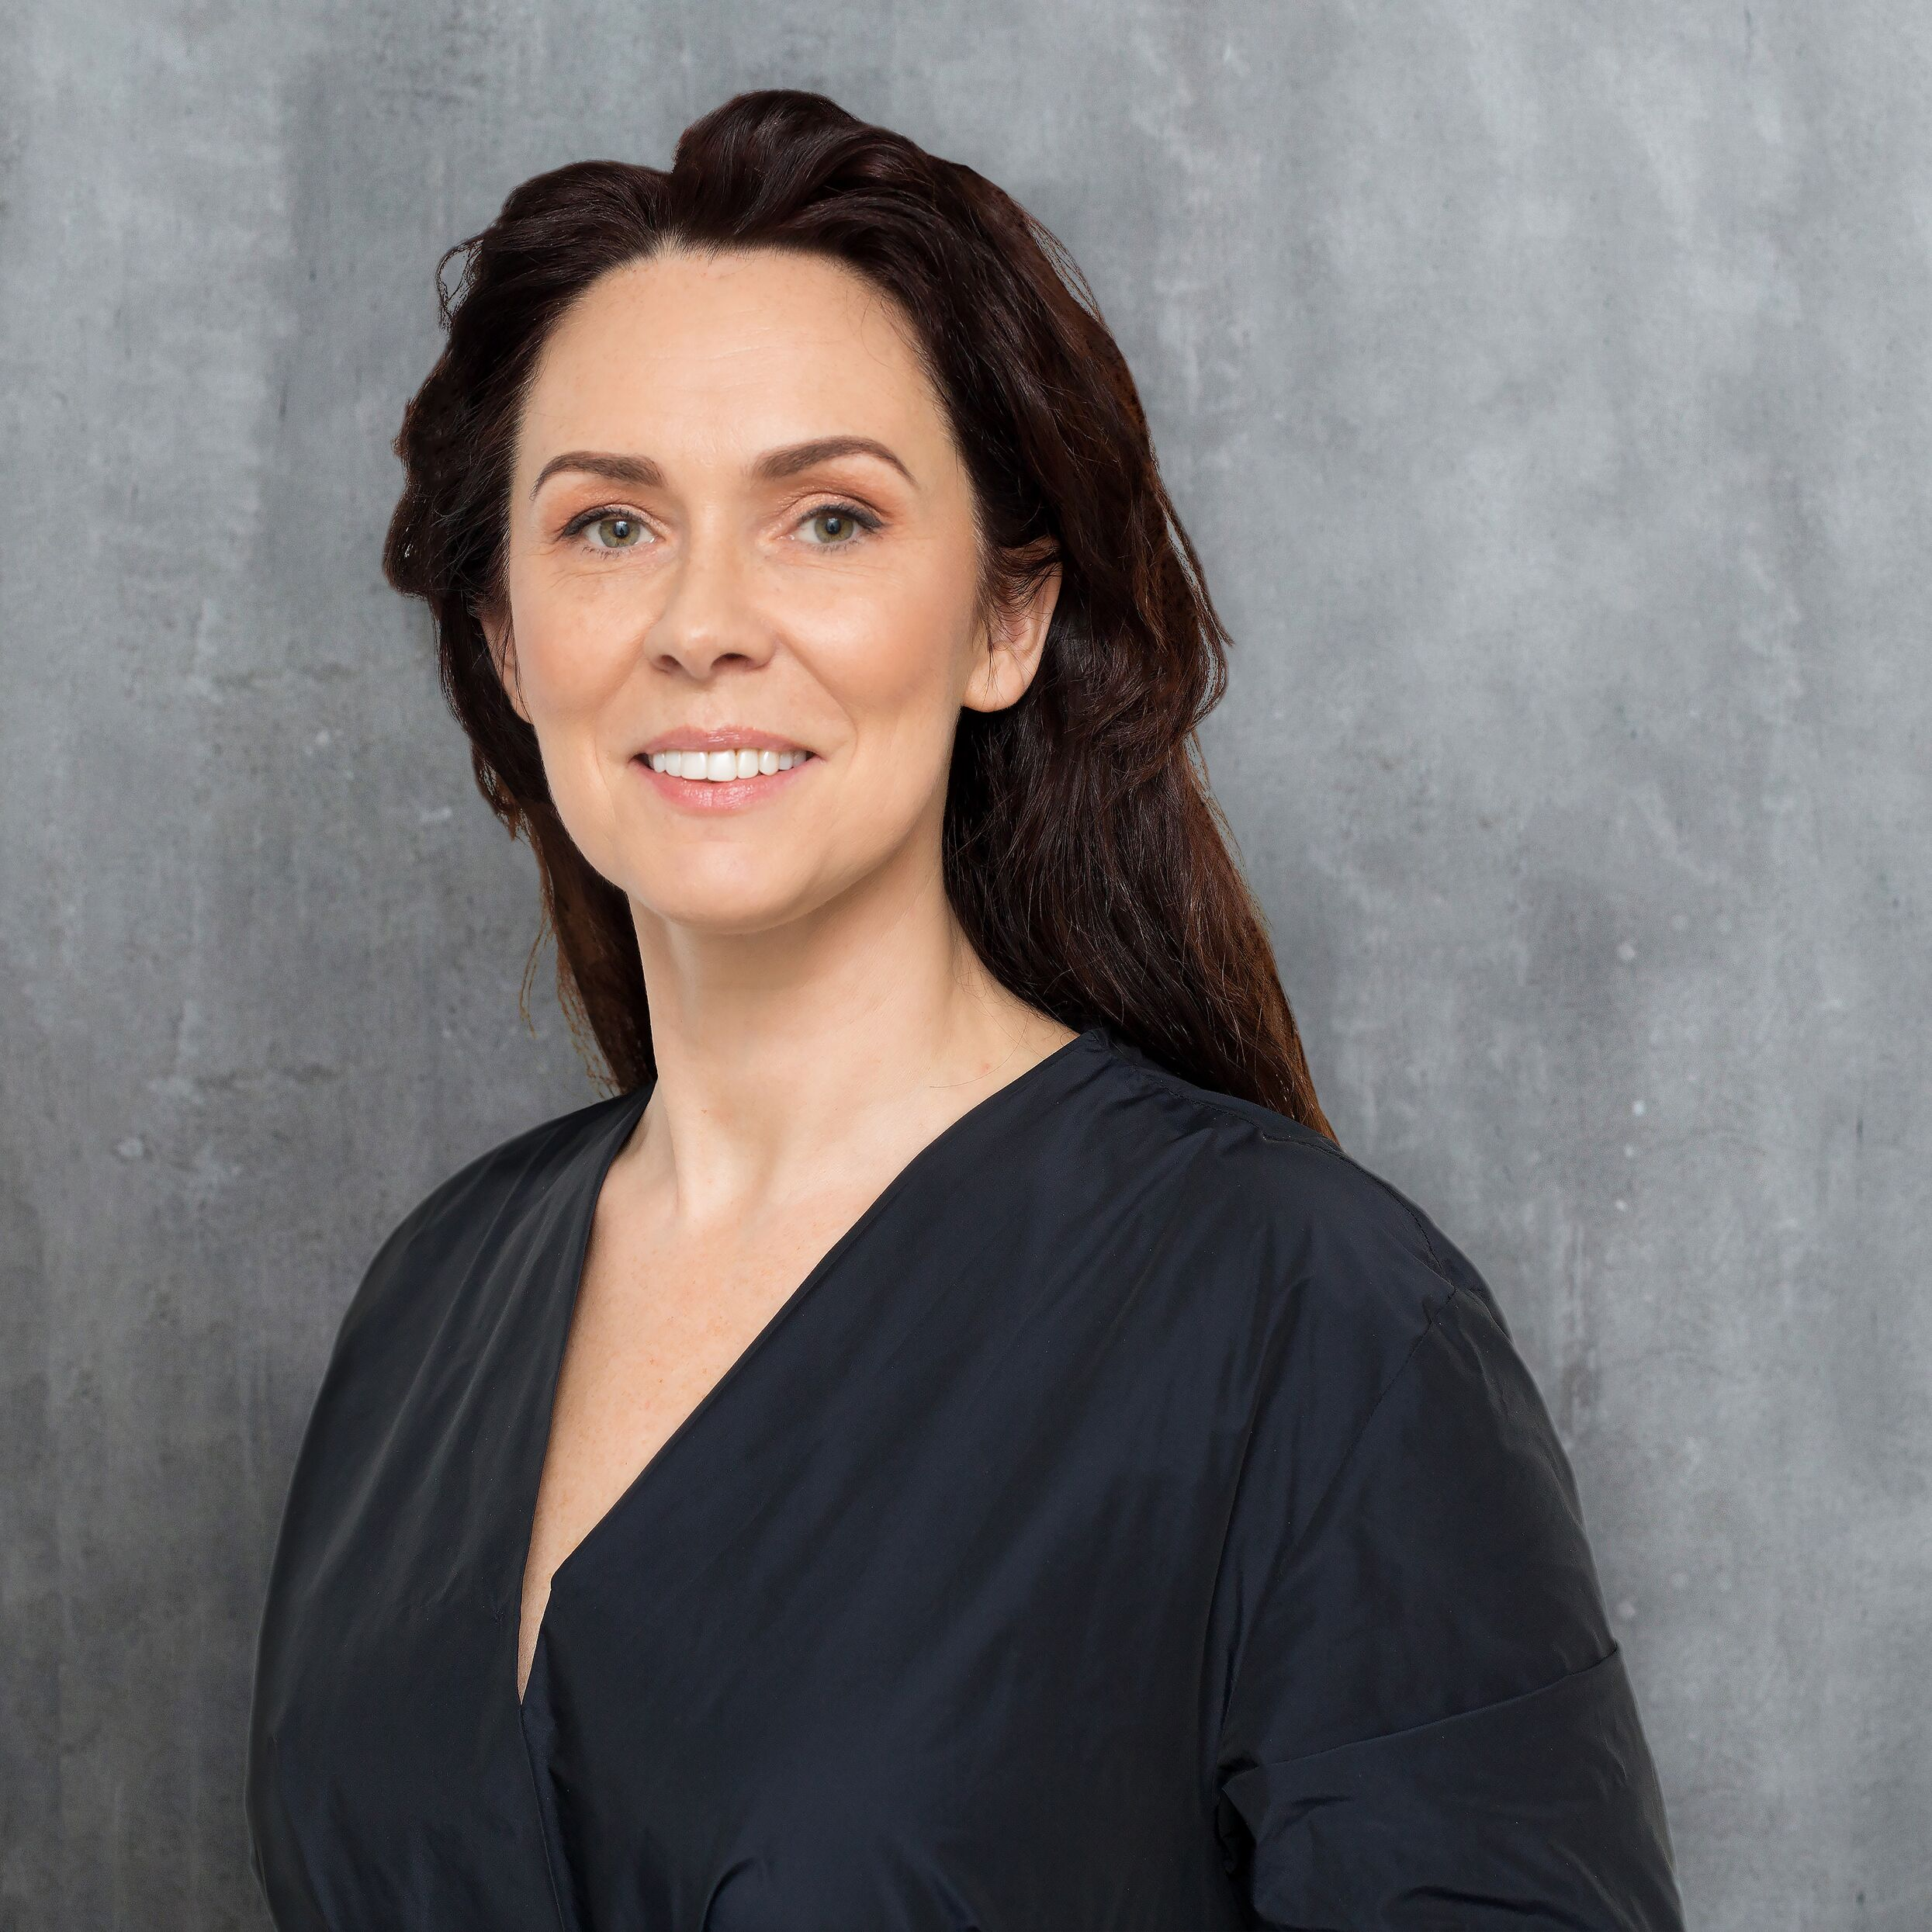 Renata Kaminskienė